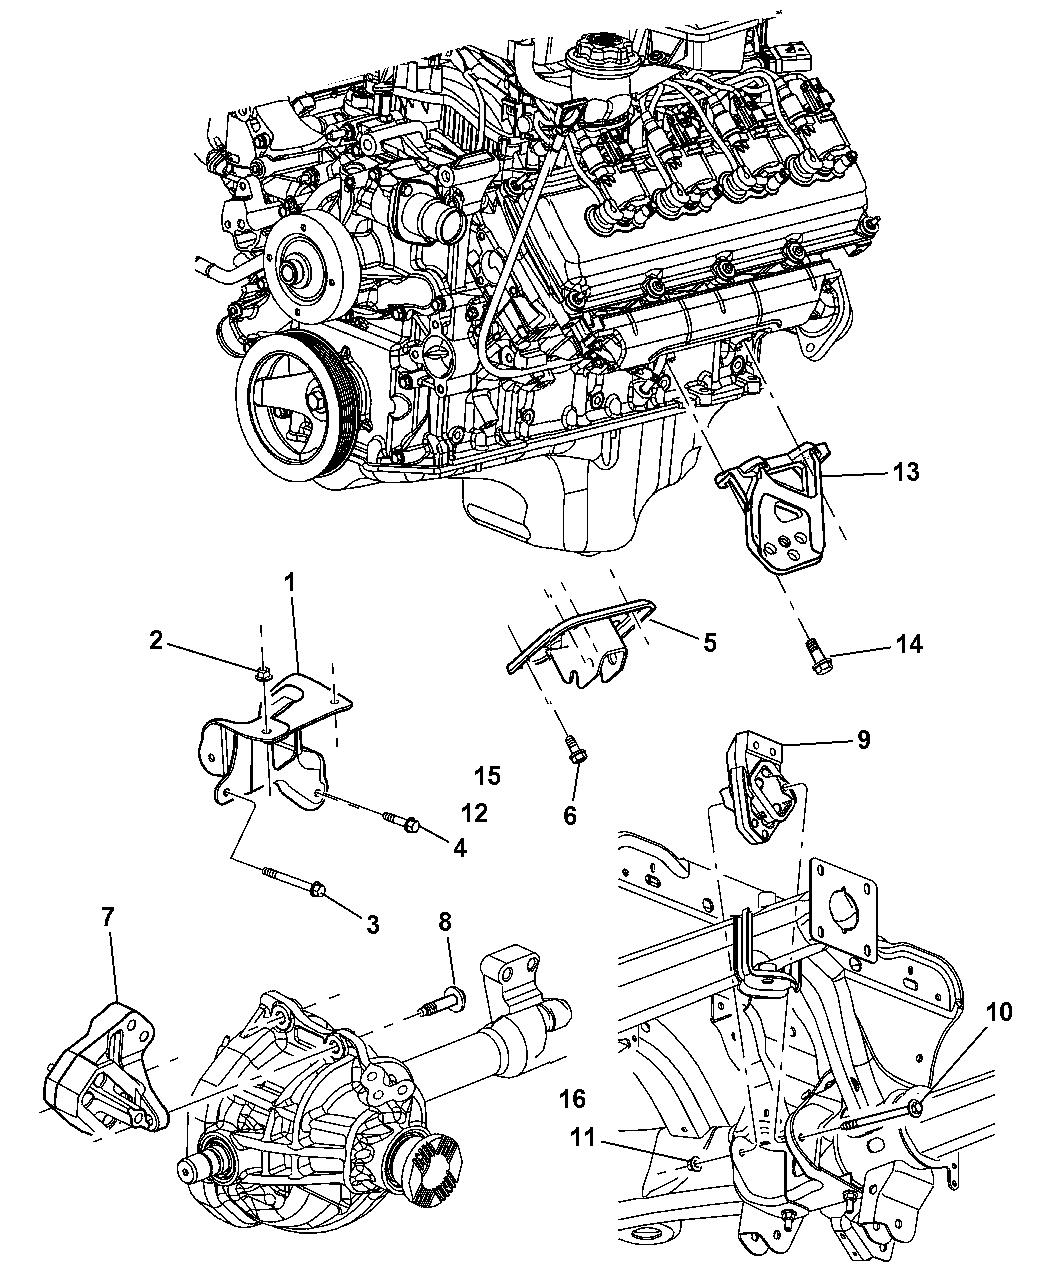 wrg 1635] 2004 dodge durango 4x4 engine diagram 2004 dodge durango 5.7 hemi engine diagram 2004 dodge durango engine diagram #4